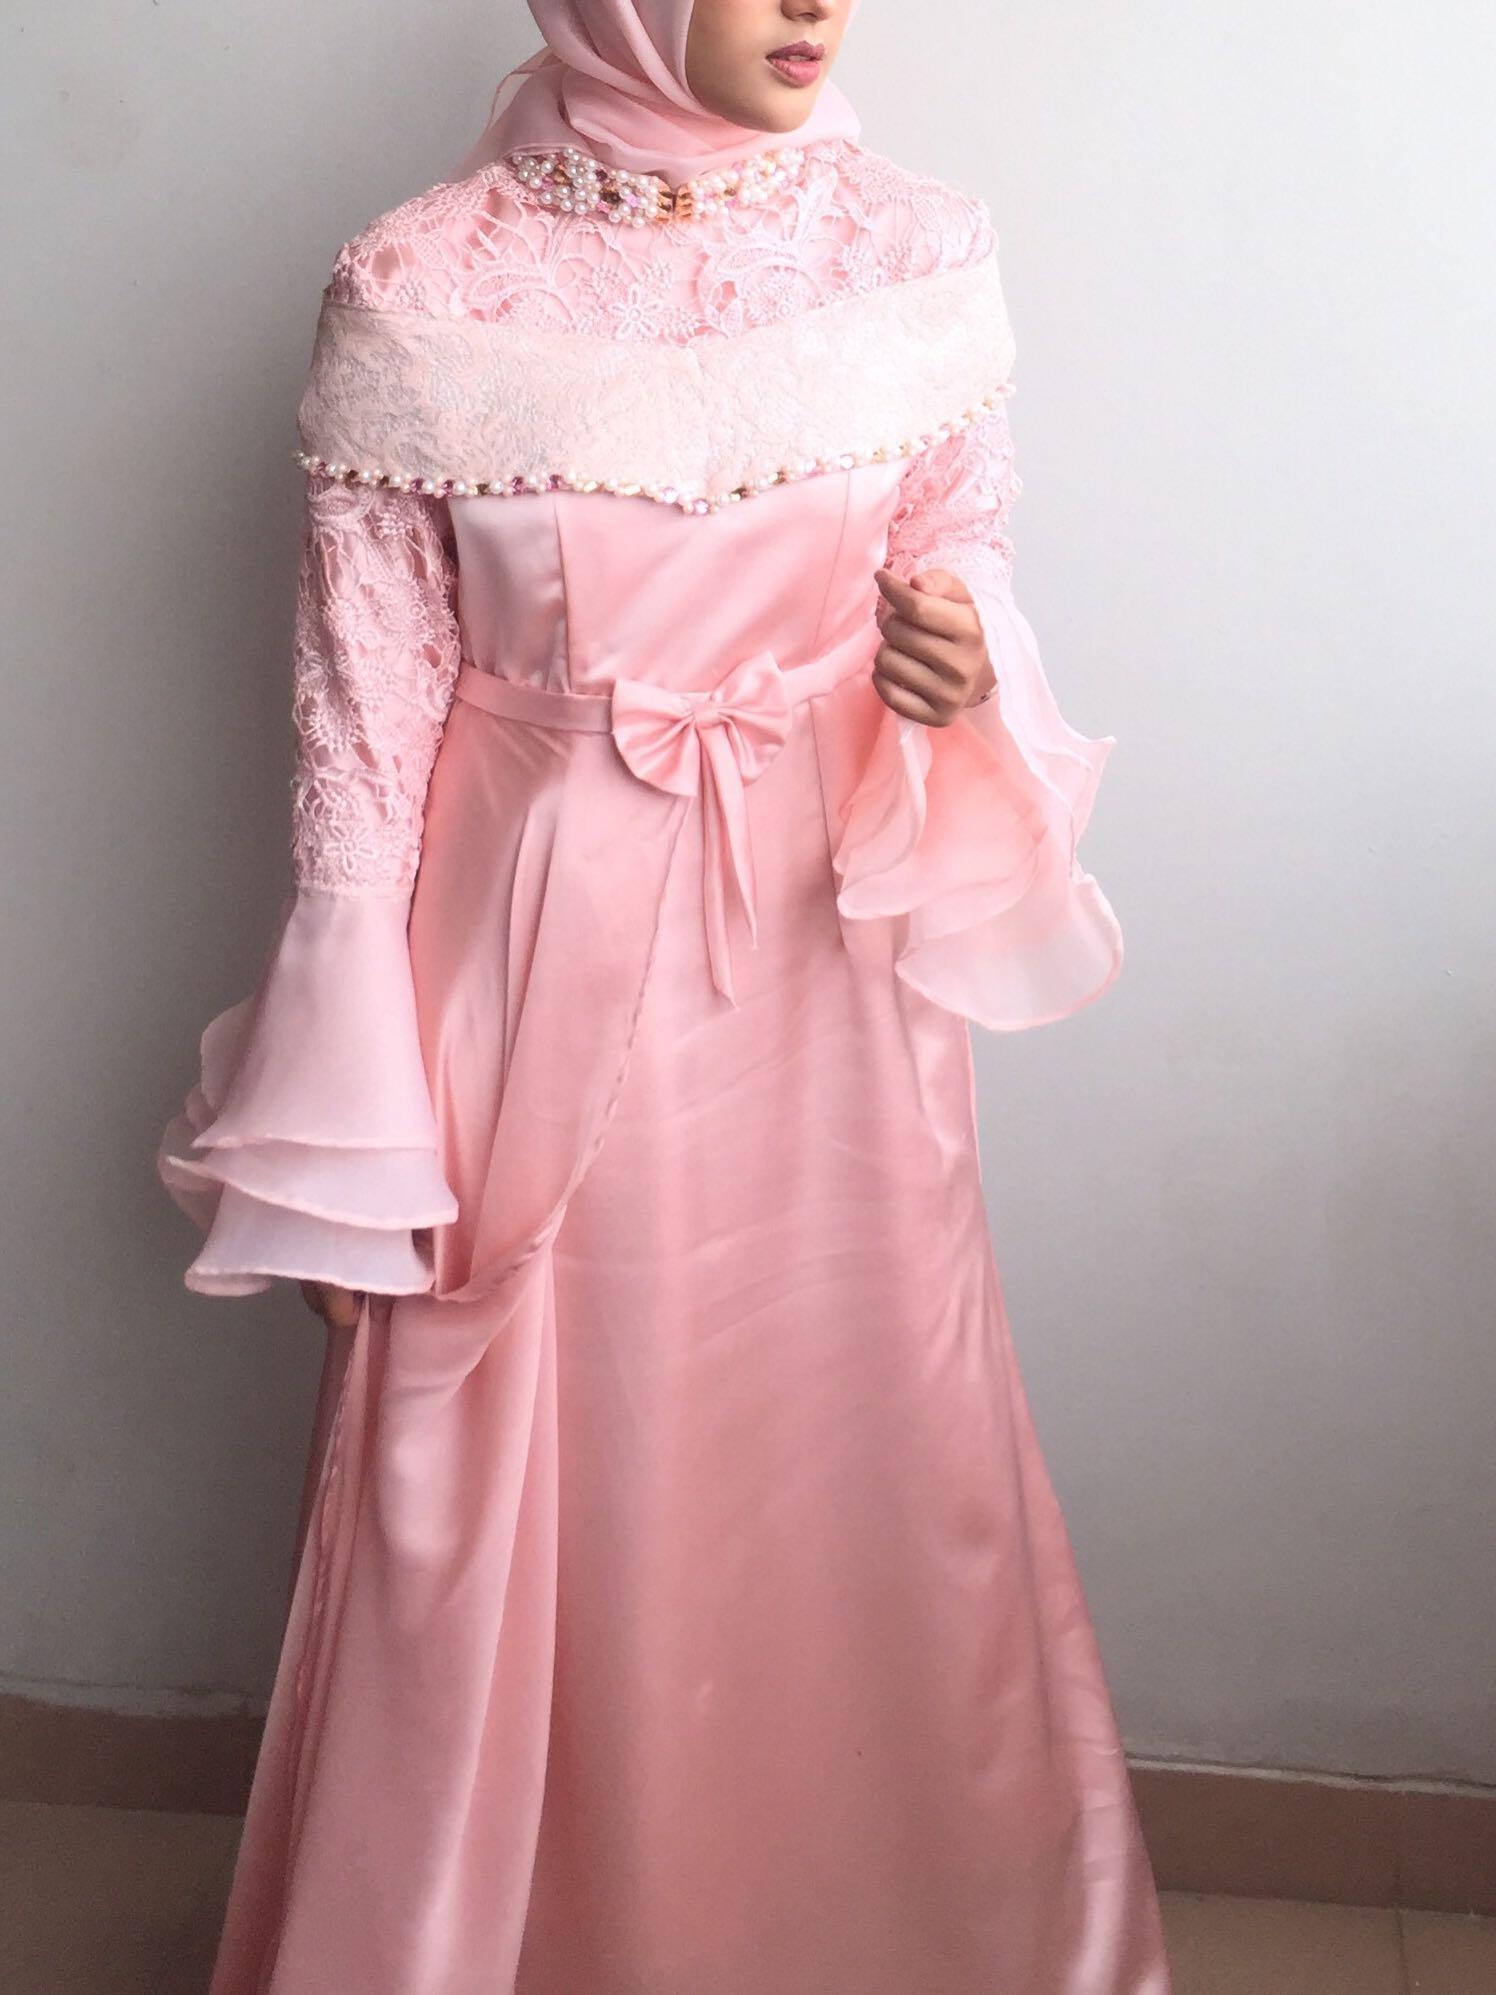 Gaun Pesta Hijab Women S Fashion Women S Clothes Dresses Skirts